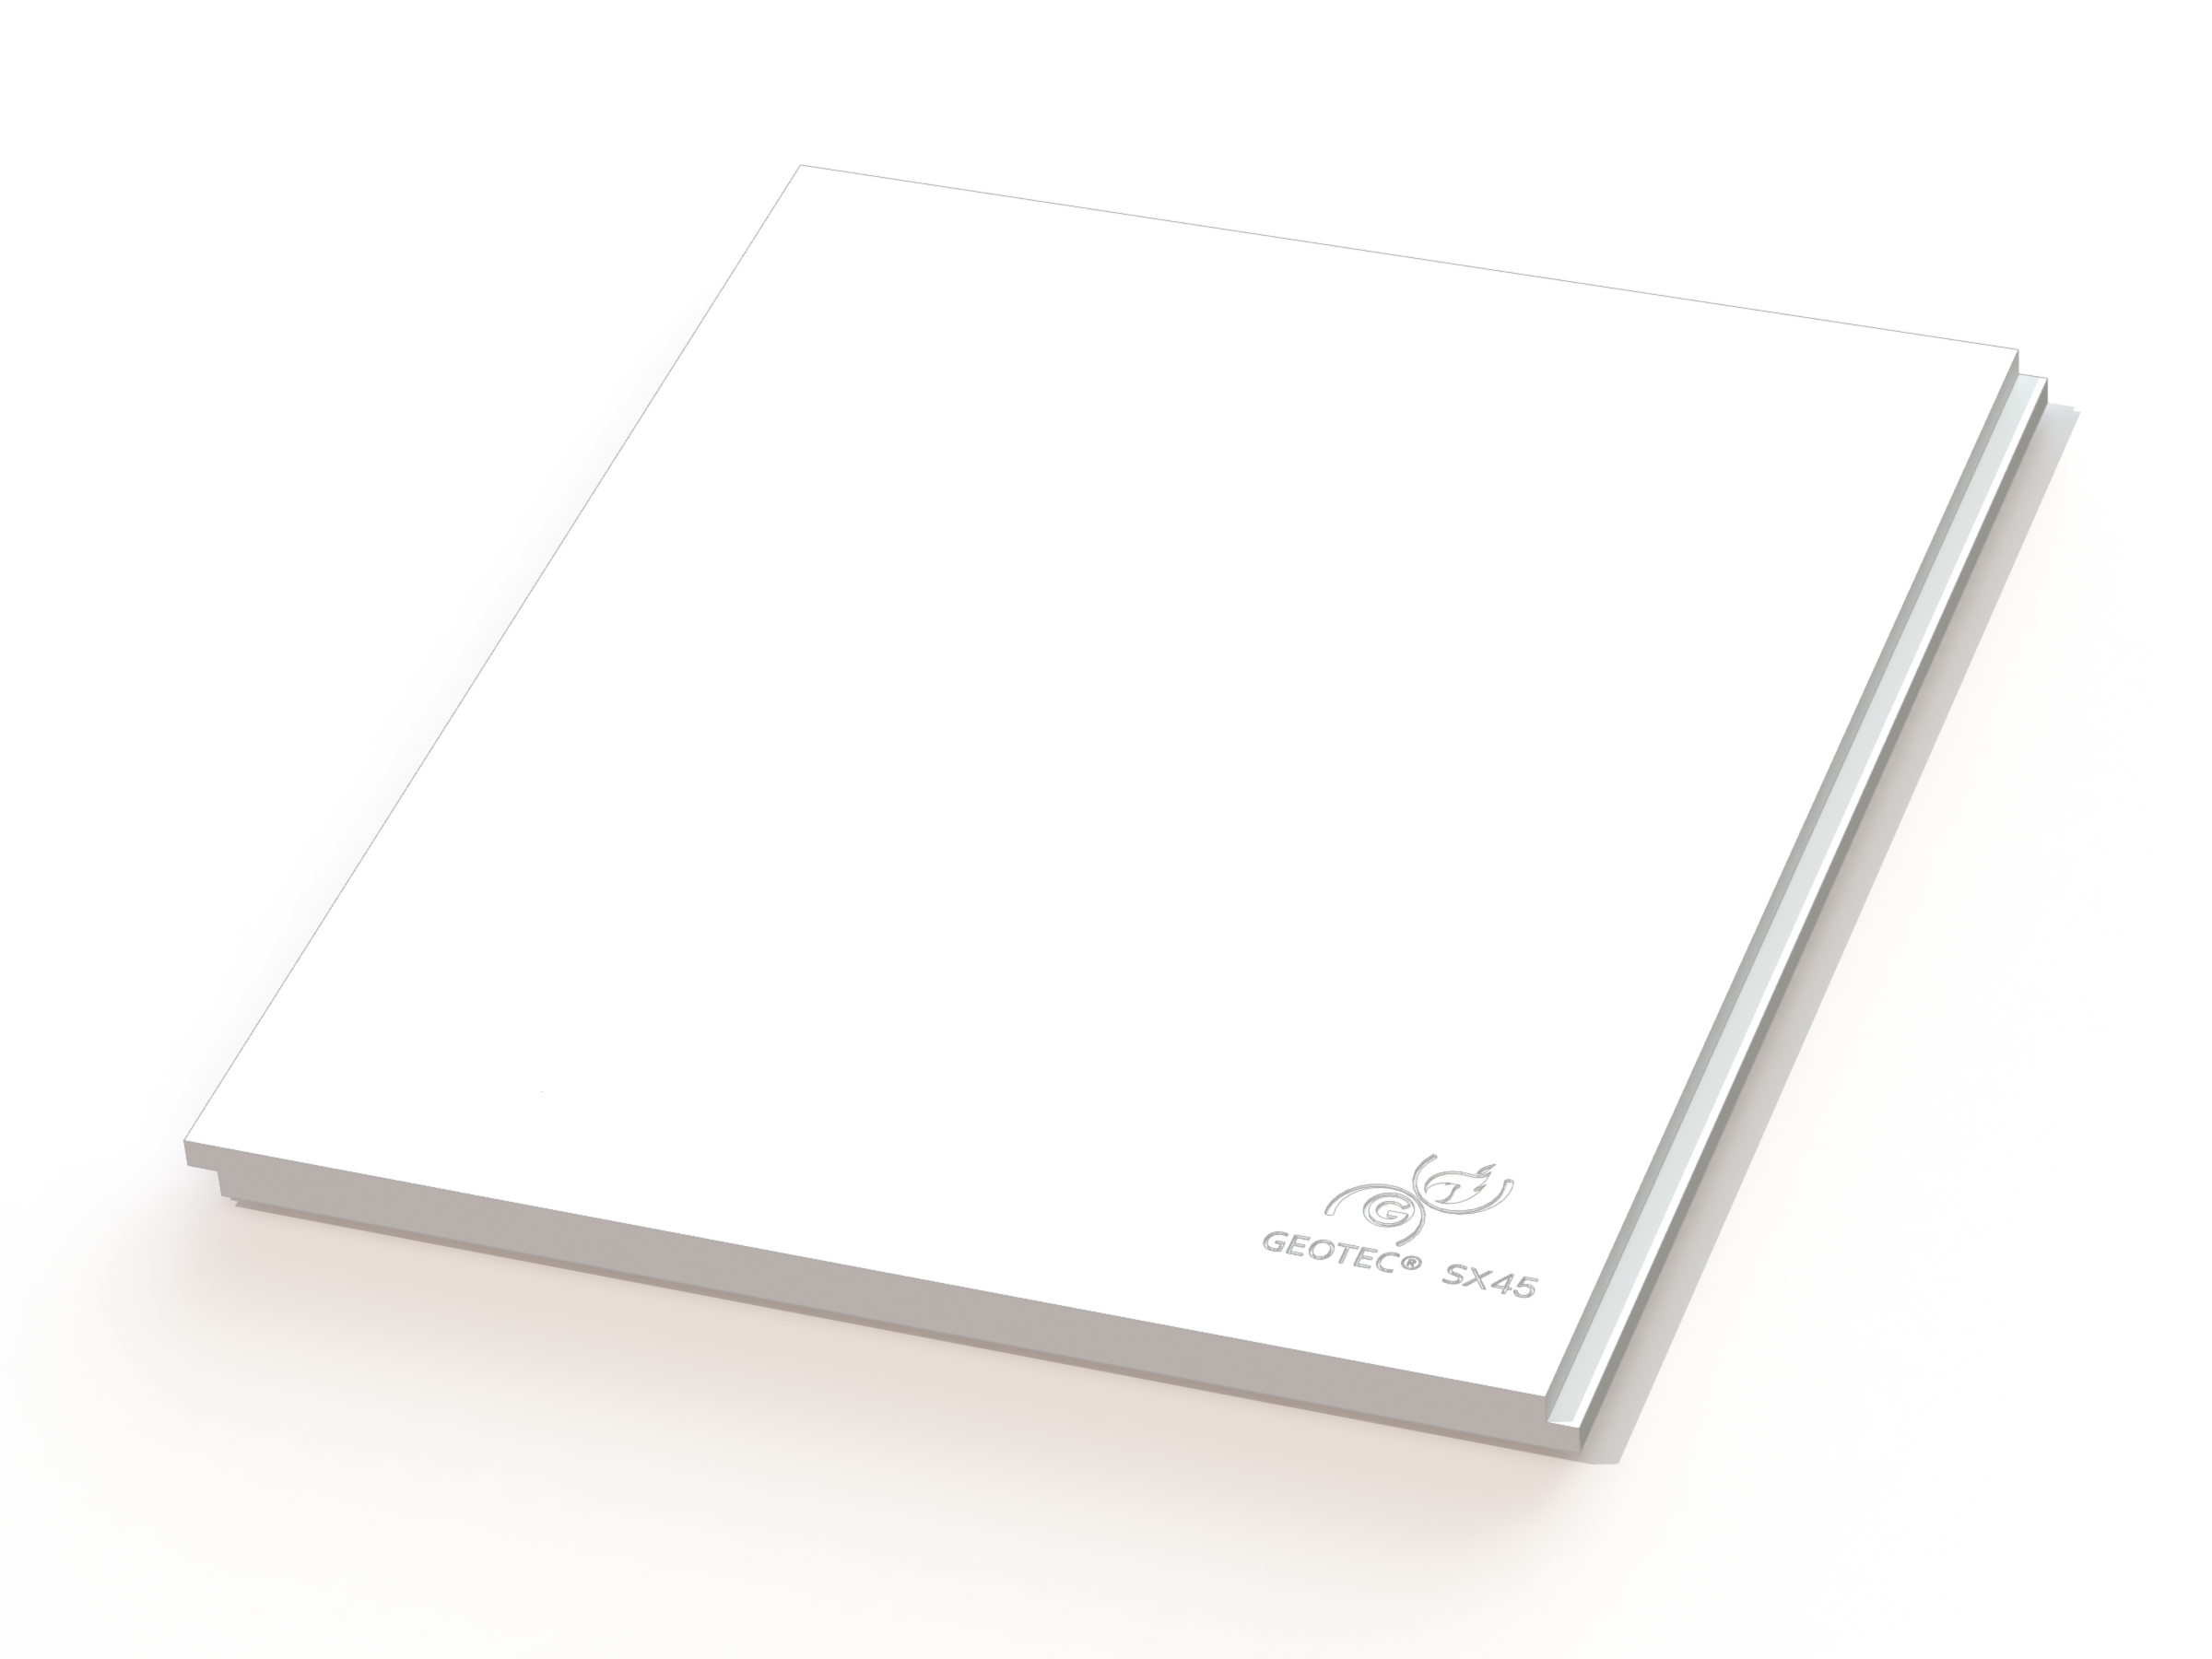 Plaque GEOTEC® SX45 Geostaff